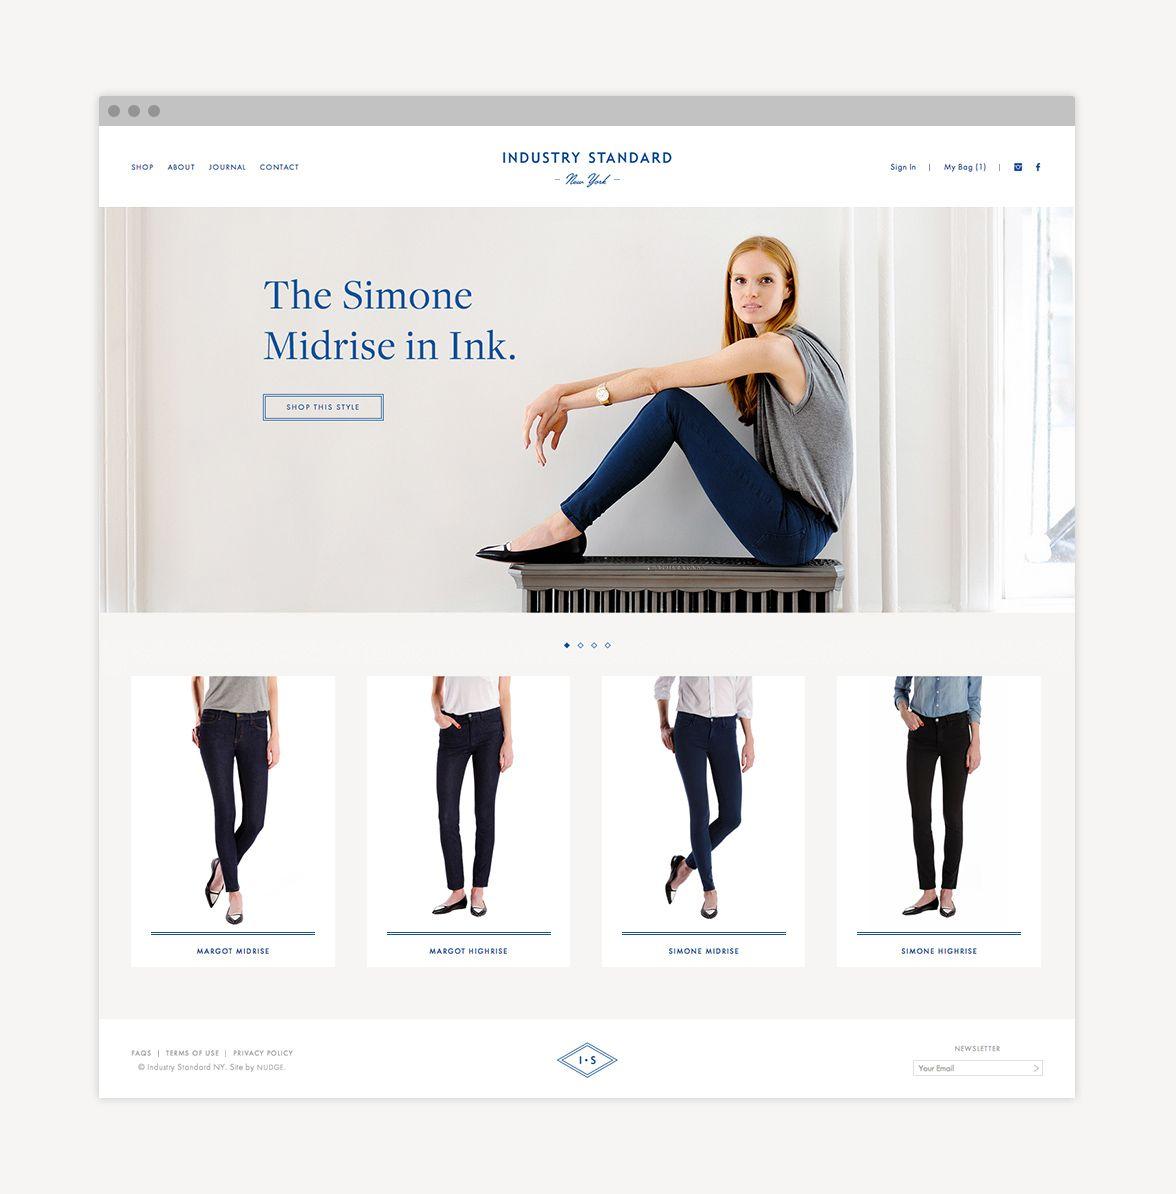 Industry Standard website designed by Nudge